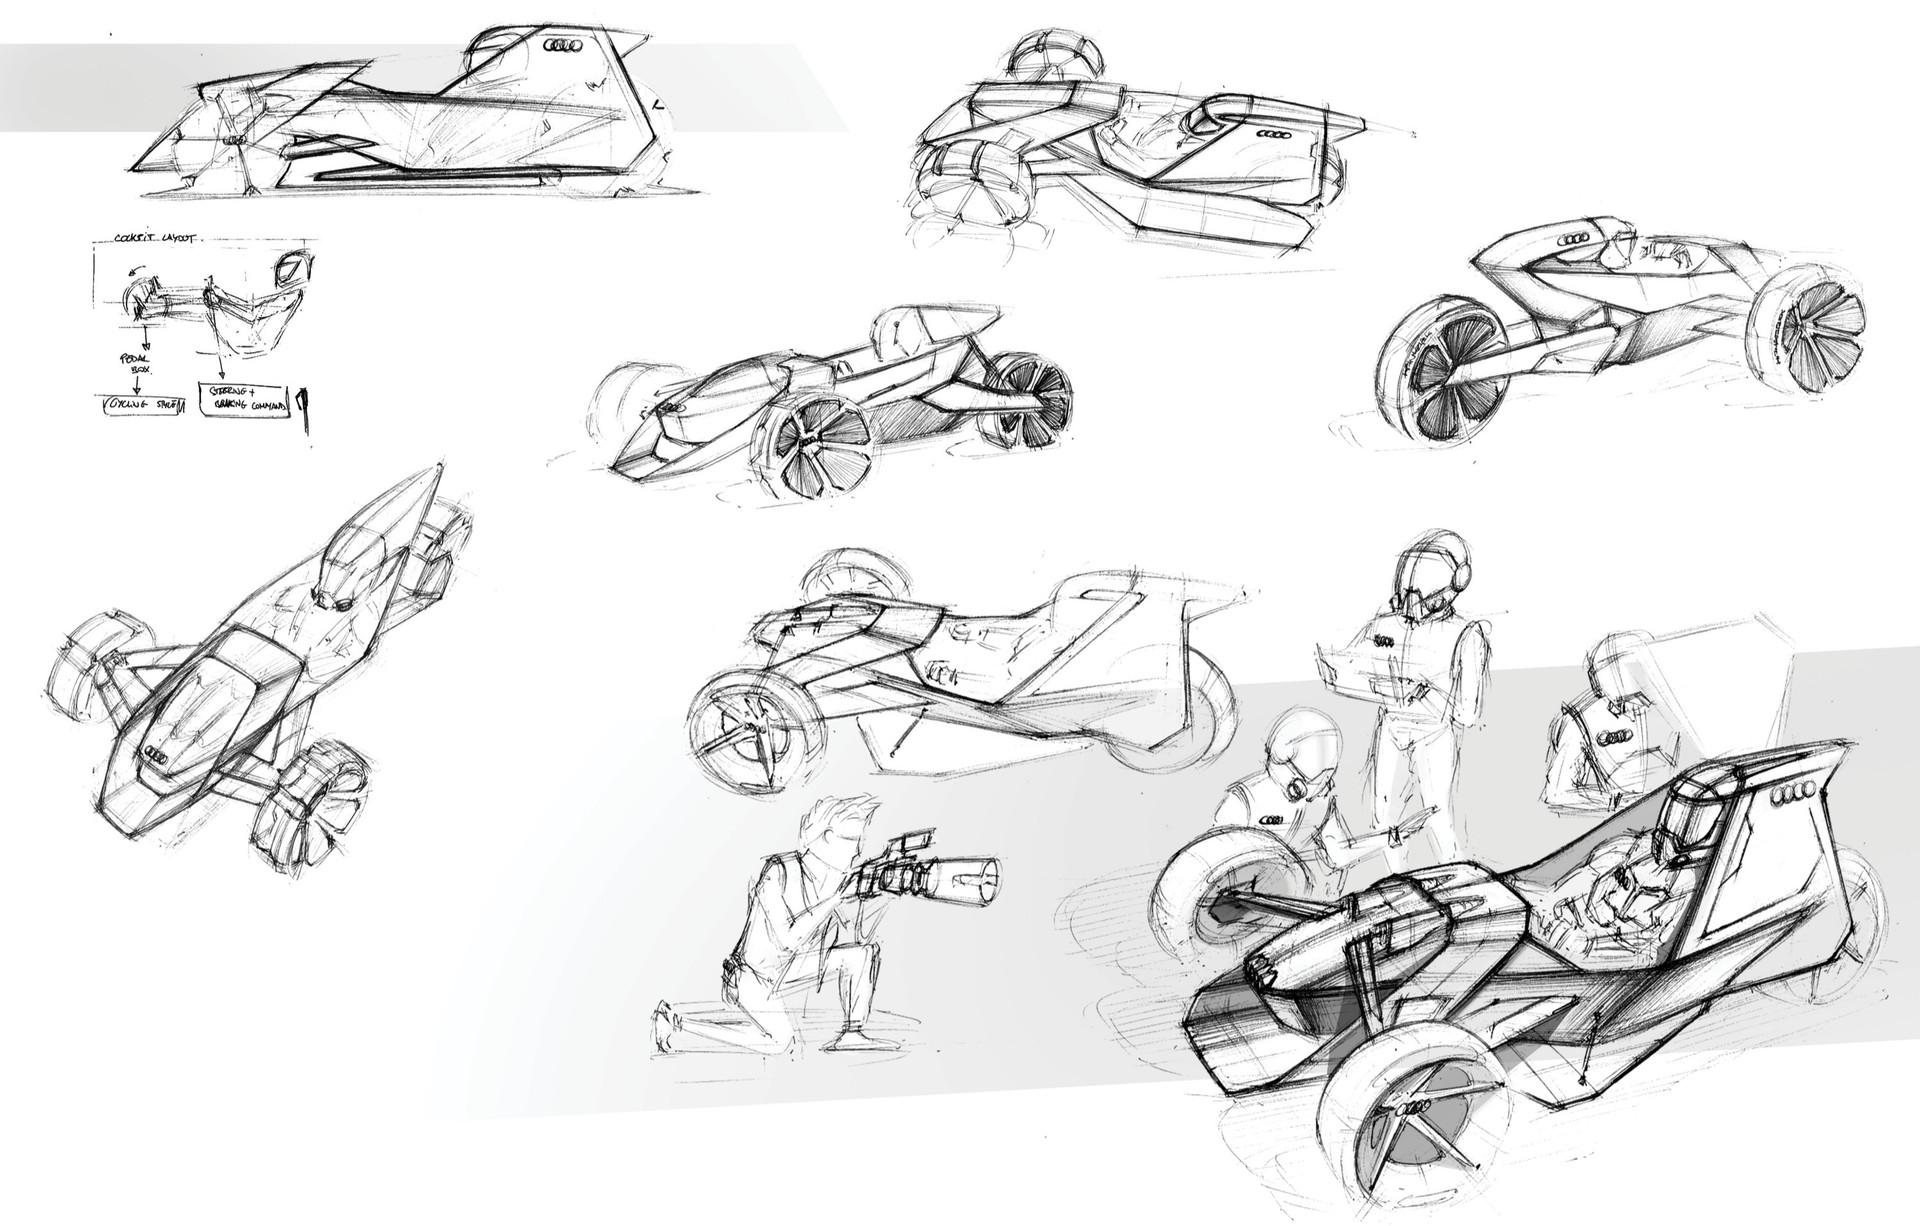 Audi Man-Powered Electric Vehicle